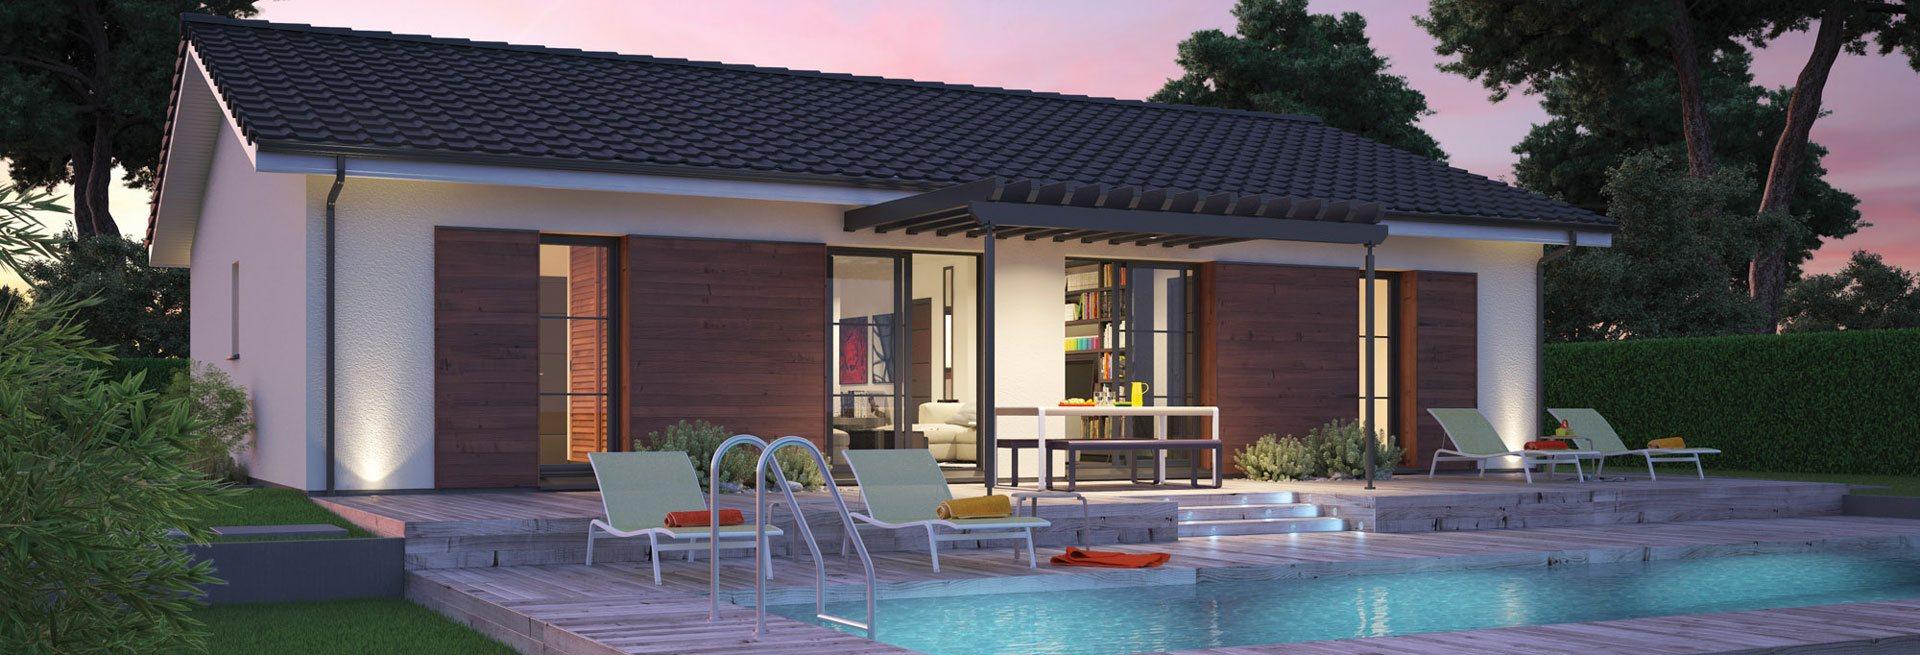 model de villa basse maison moderne